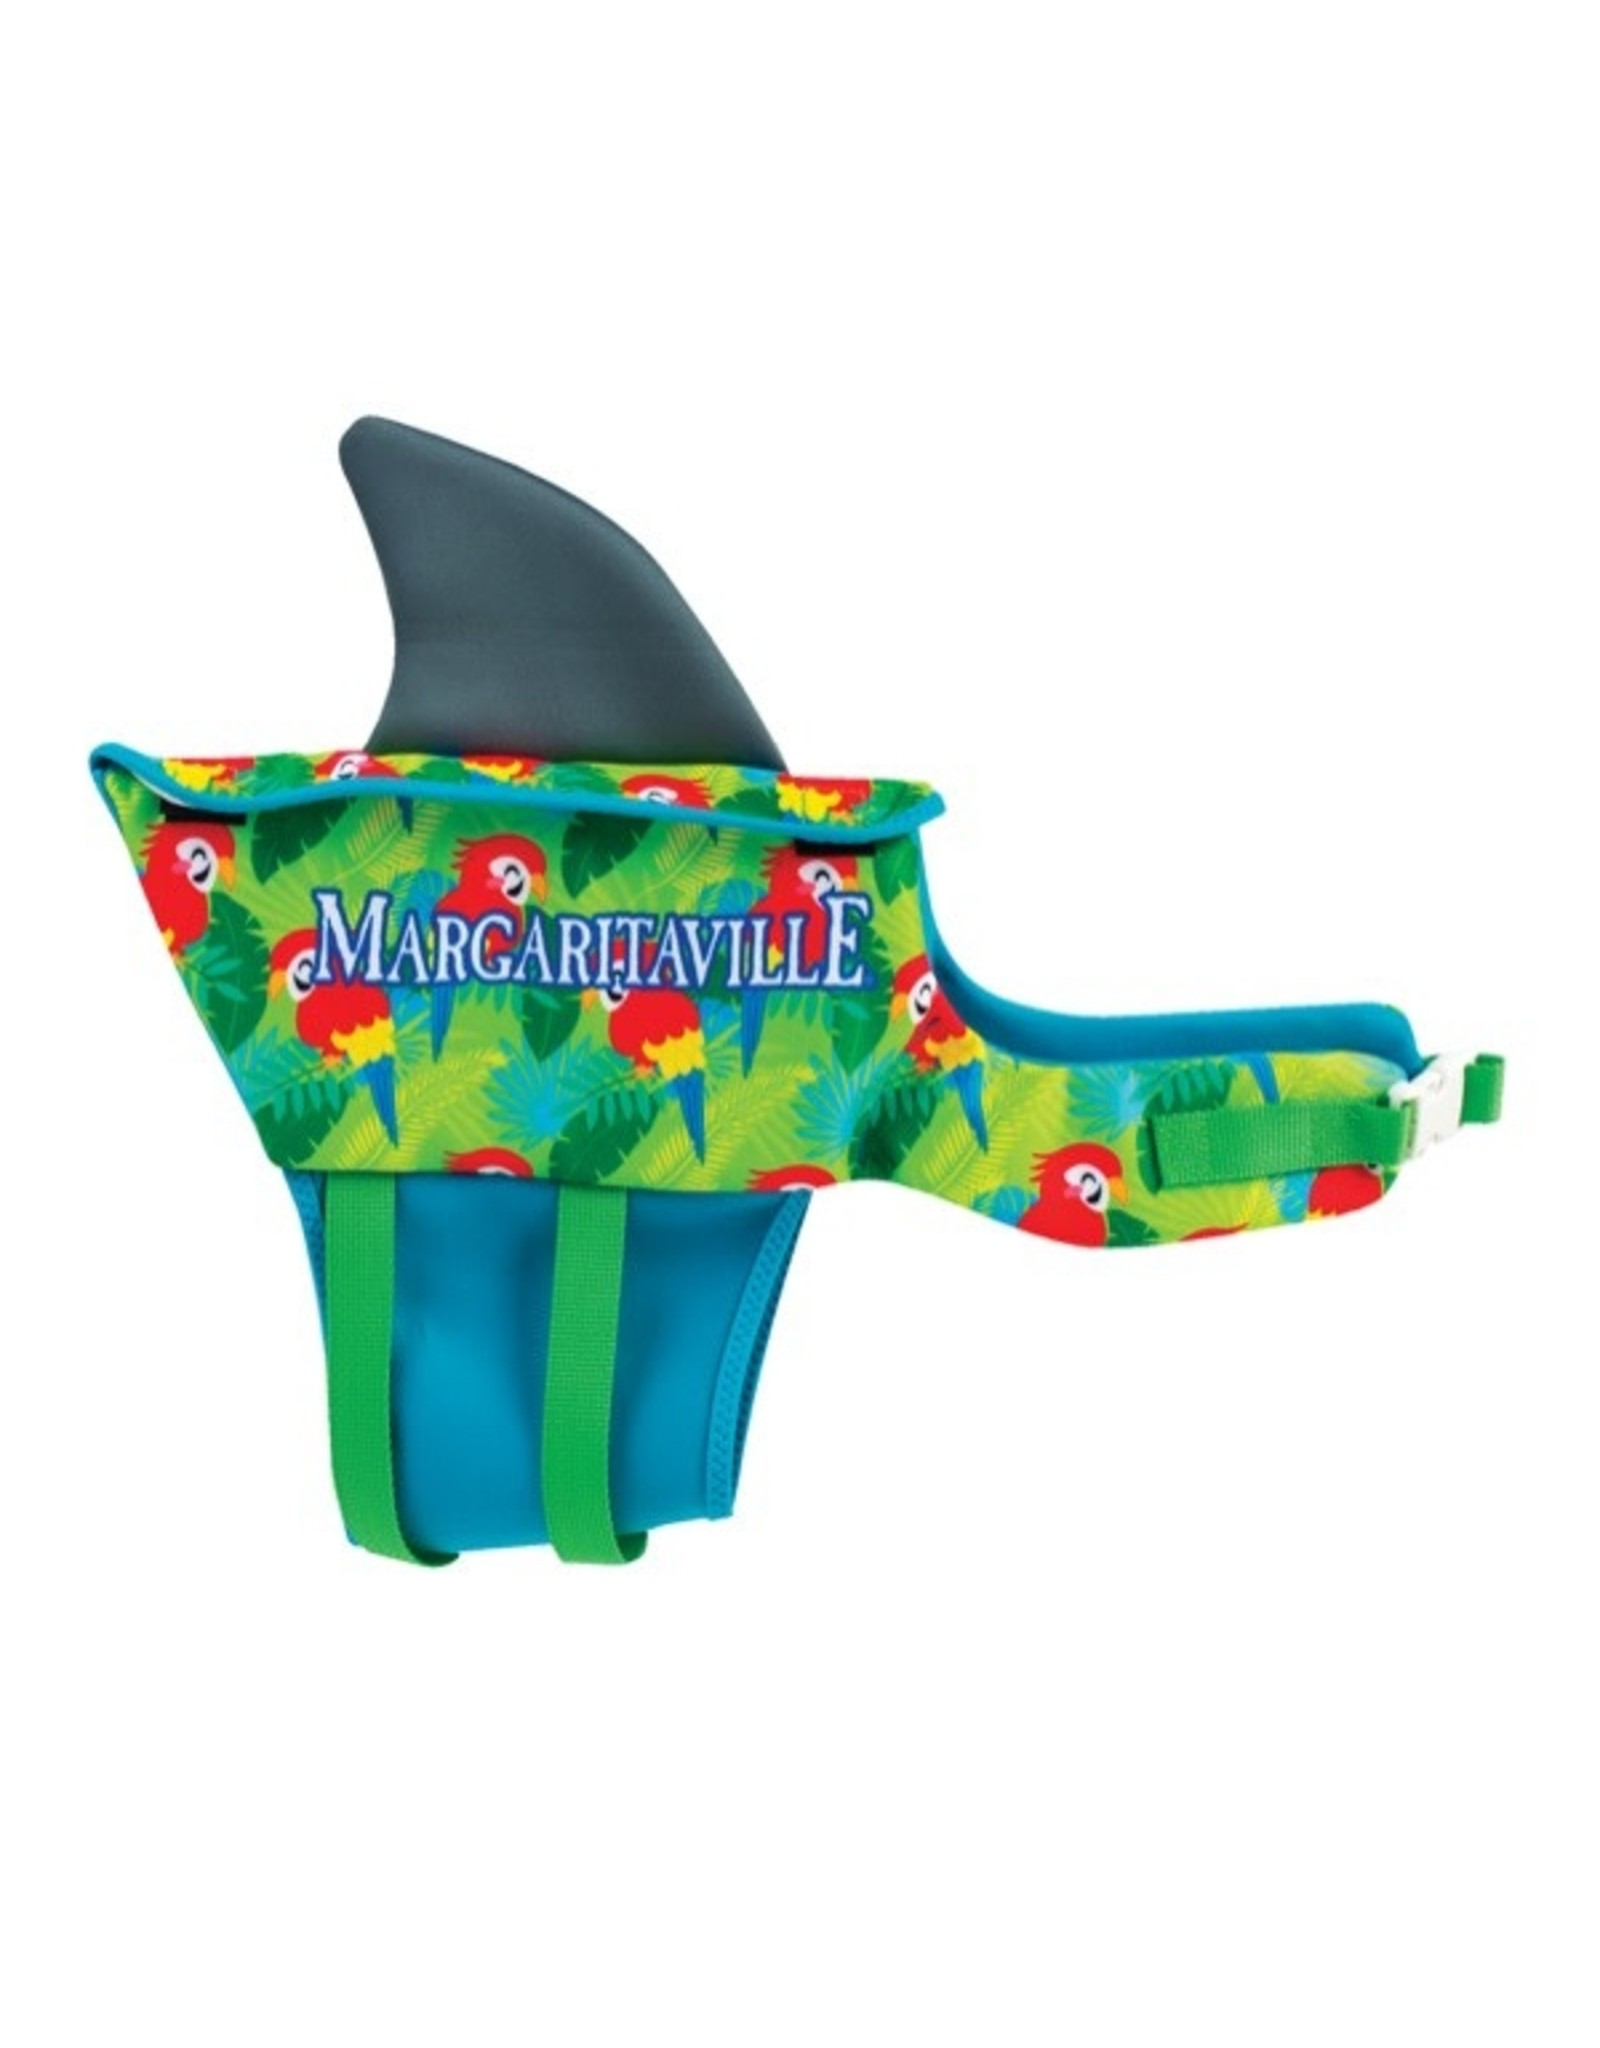 O'Brien Margaritaville Pet Vest (Green)